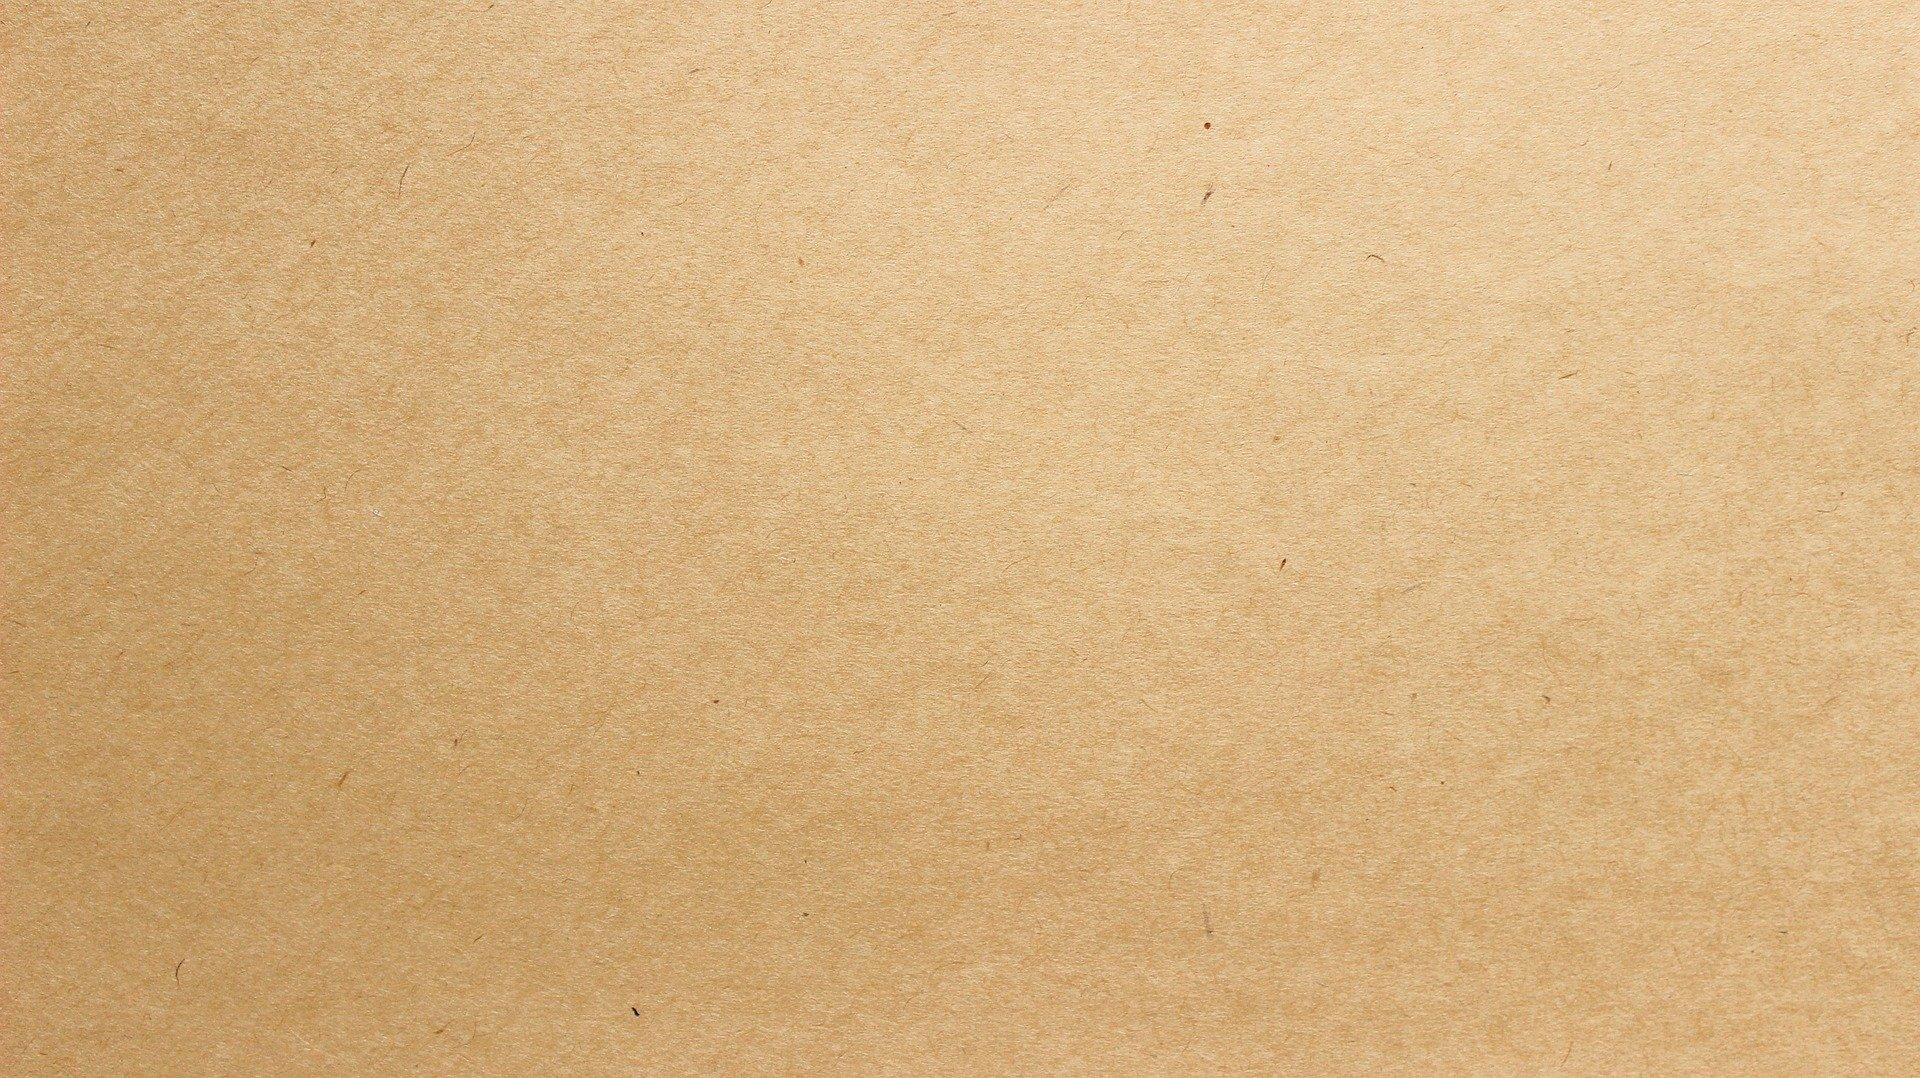 paper-1468883_1920